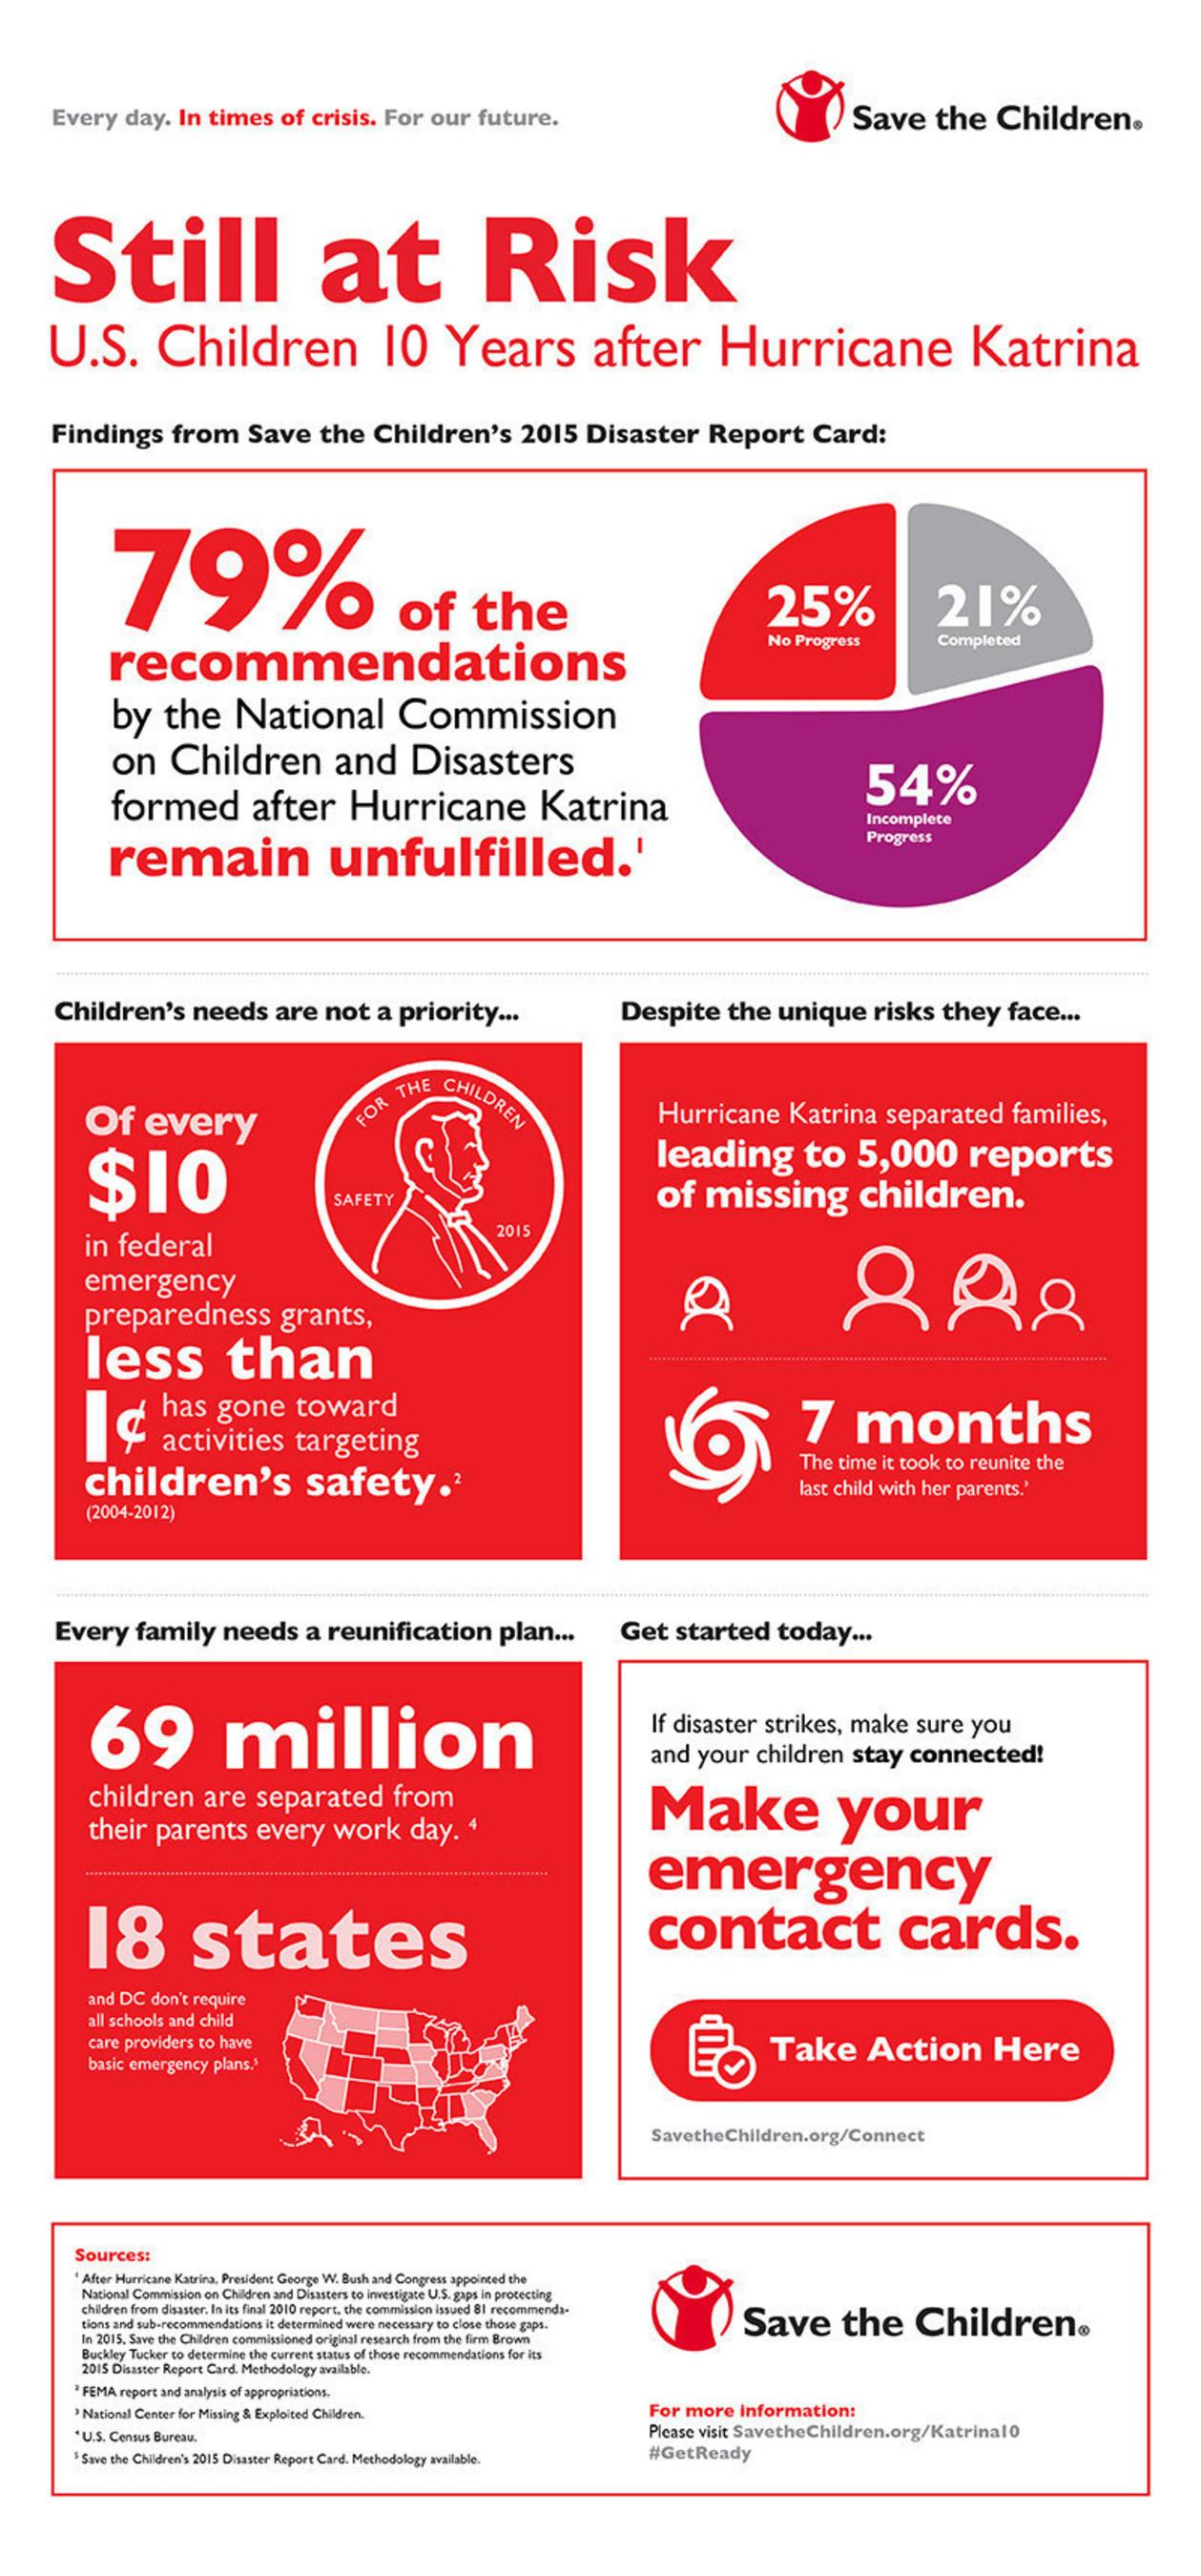 Infographic: Disaster Risks for U.S. Children